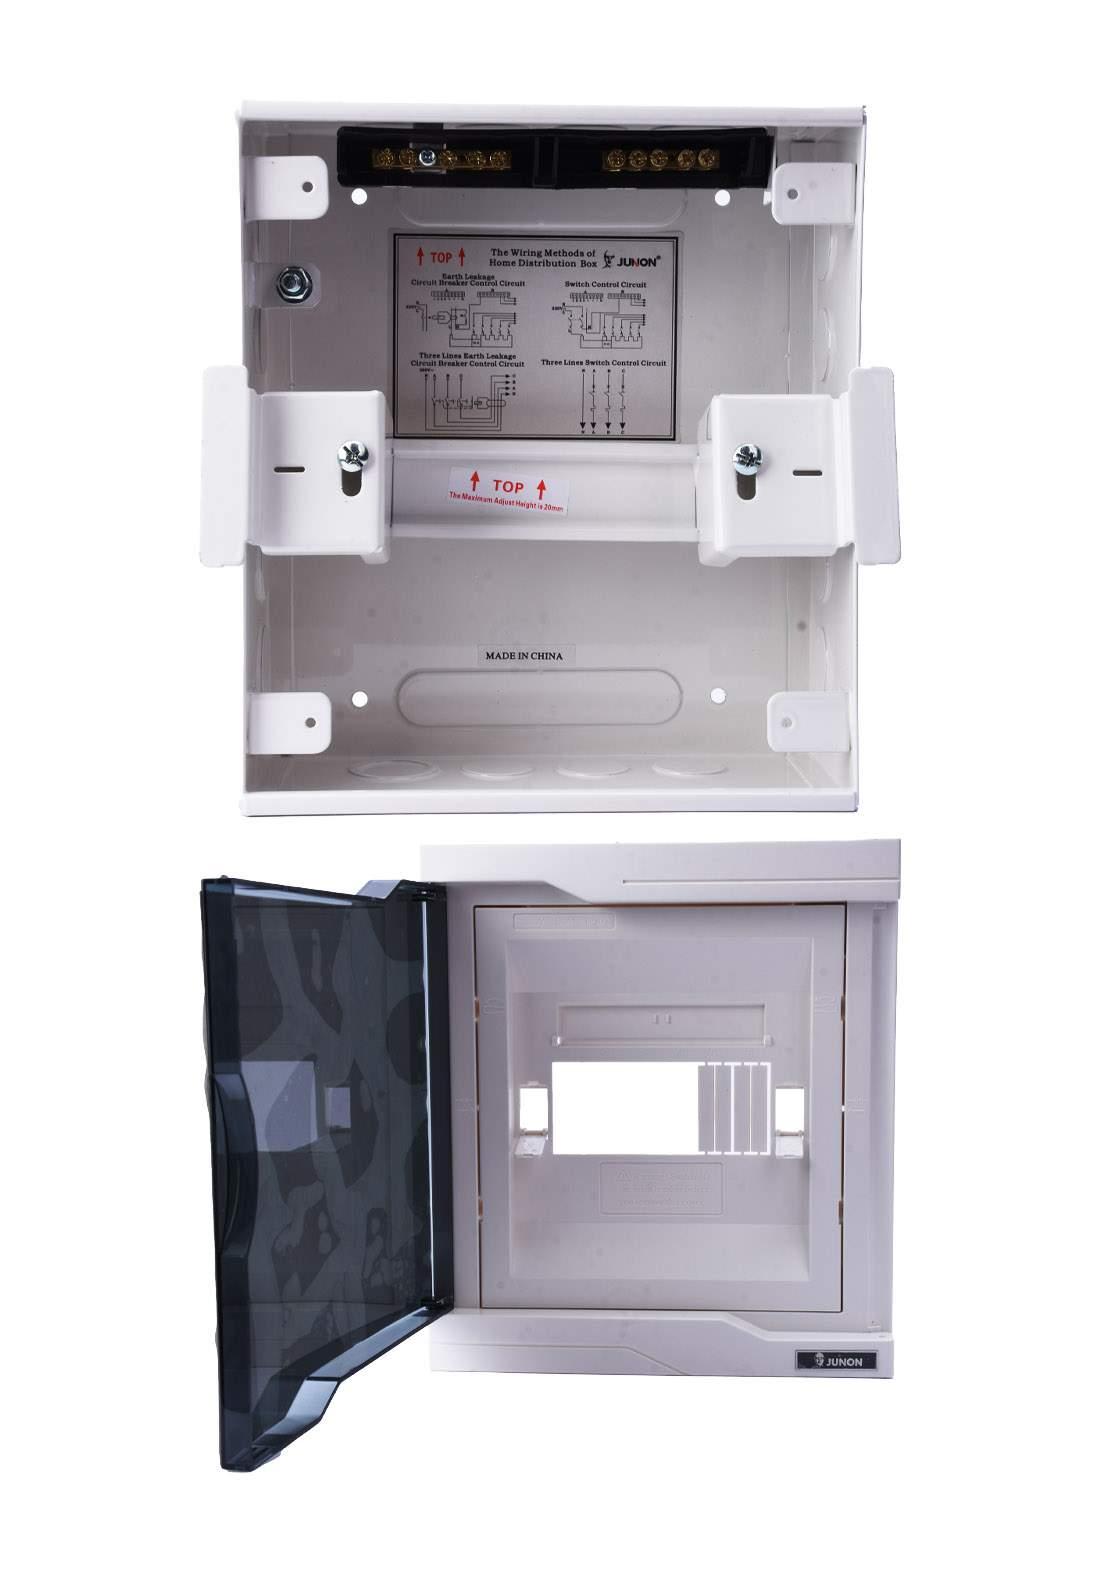 Junon DX18-A06TWB Power Distribution Box 6 Ways بوكس توزيع الكهرباء